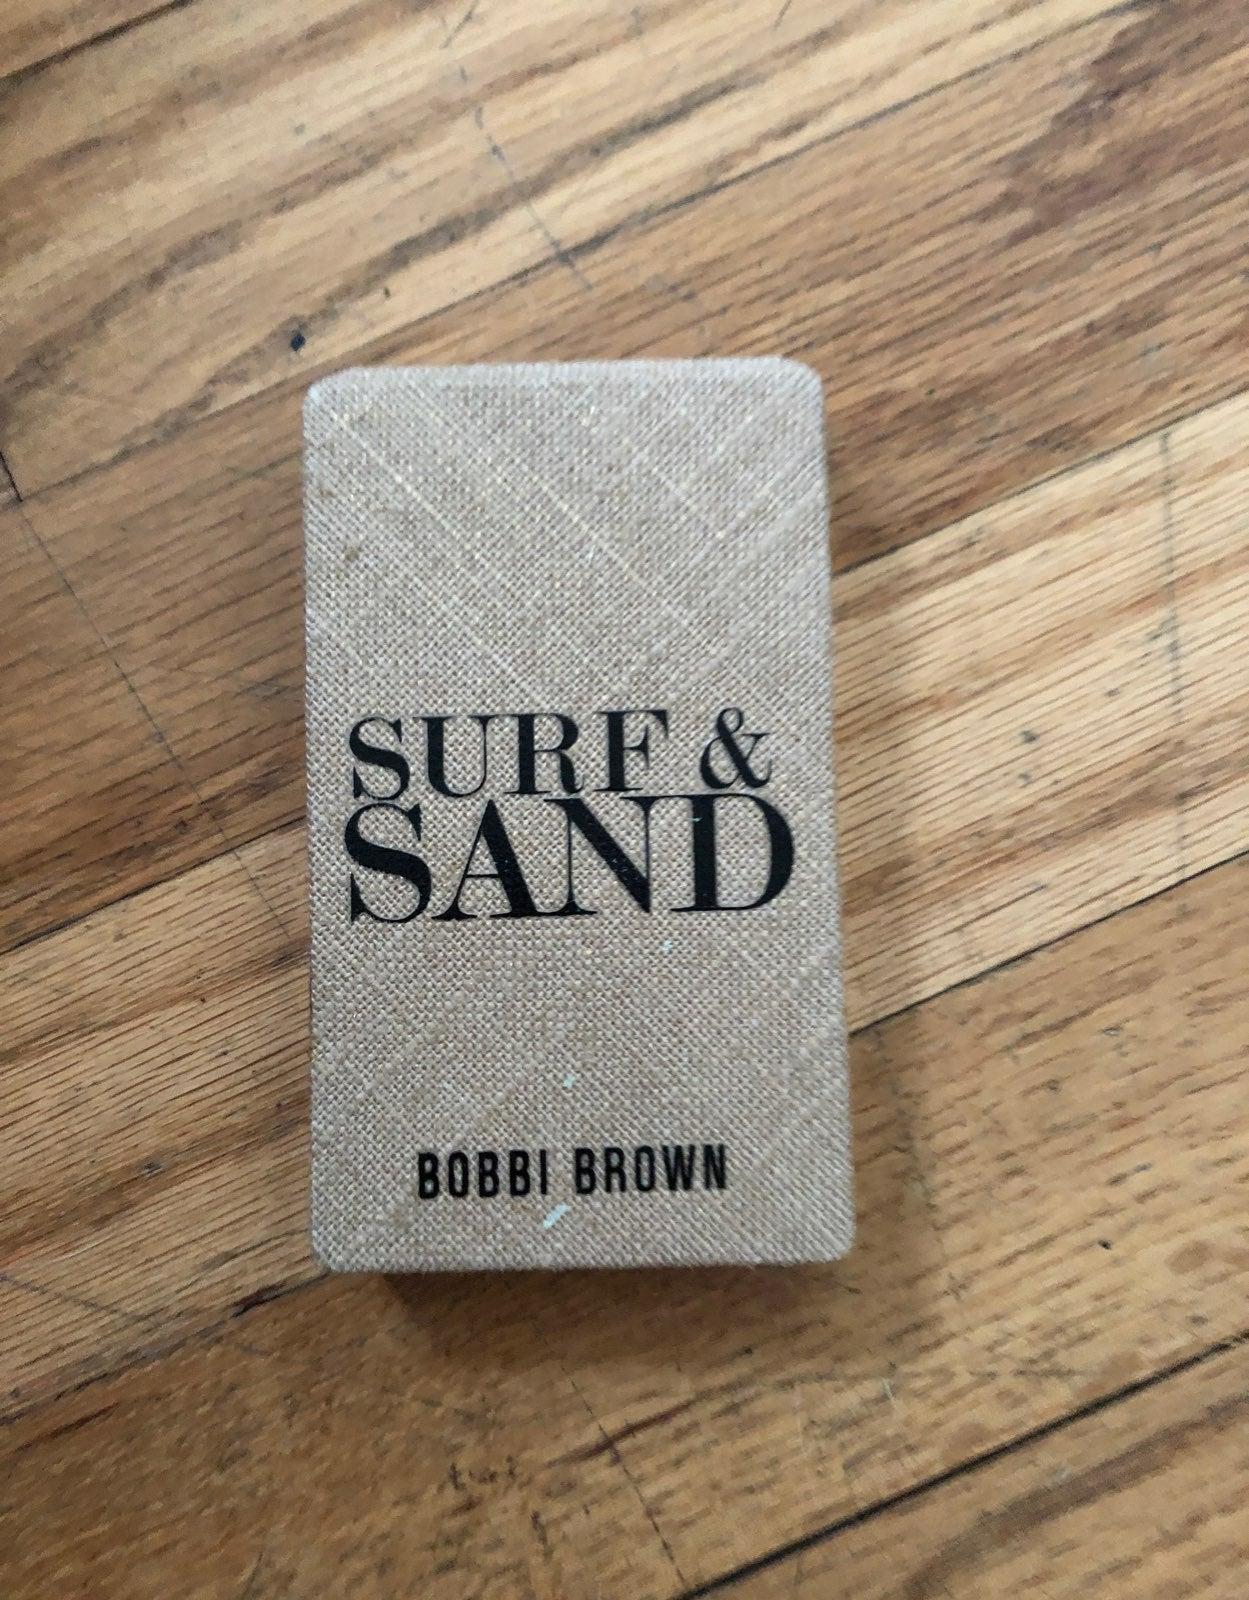 Bobbi brown Surf and Sand Eye Palette